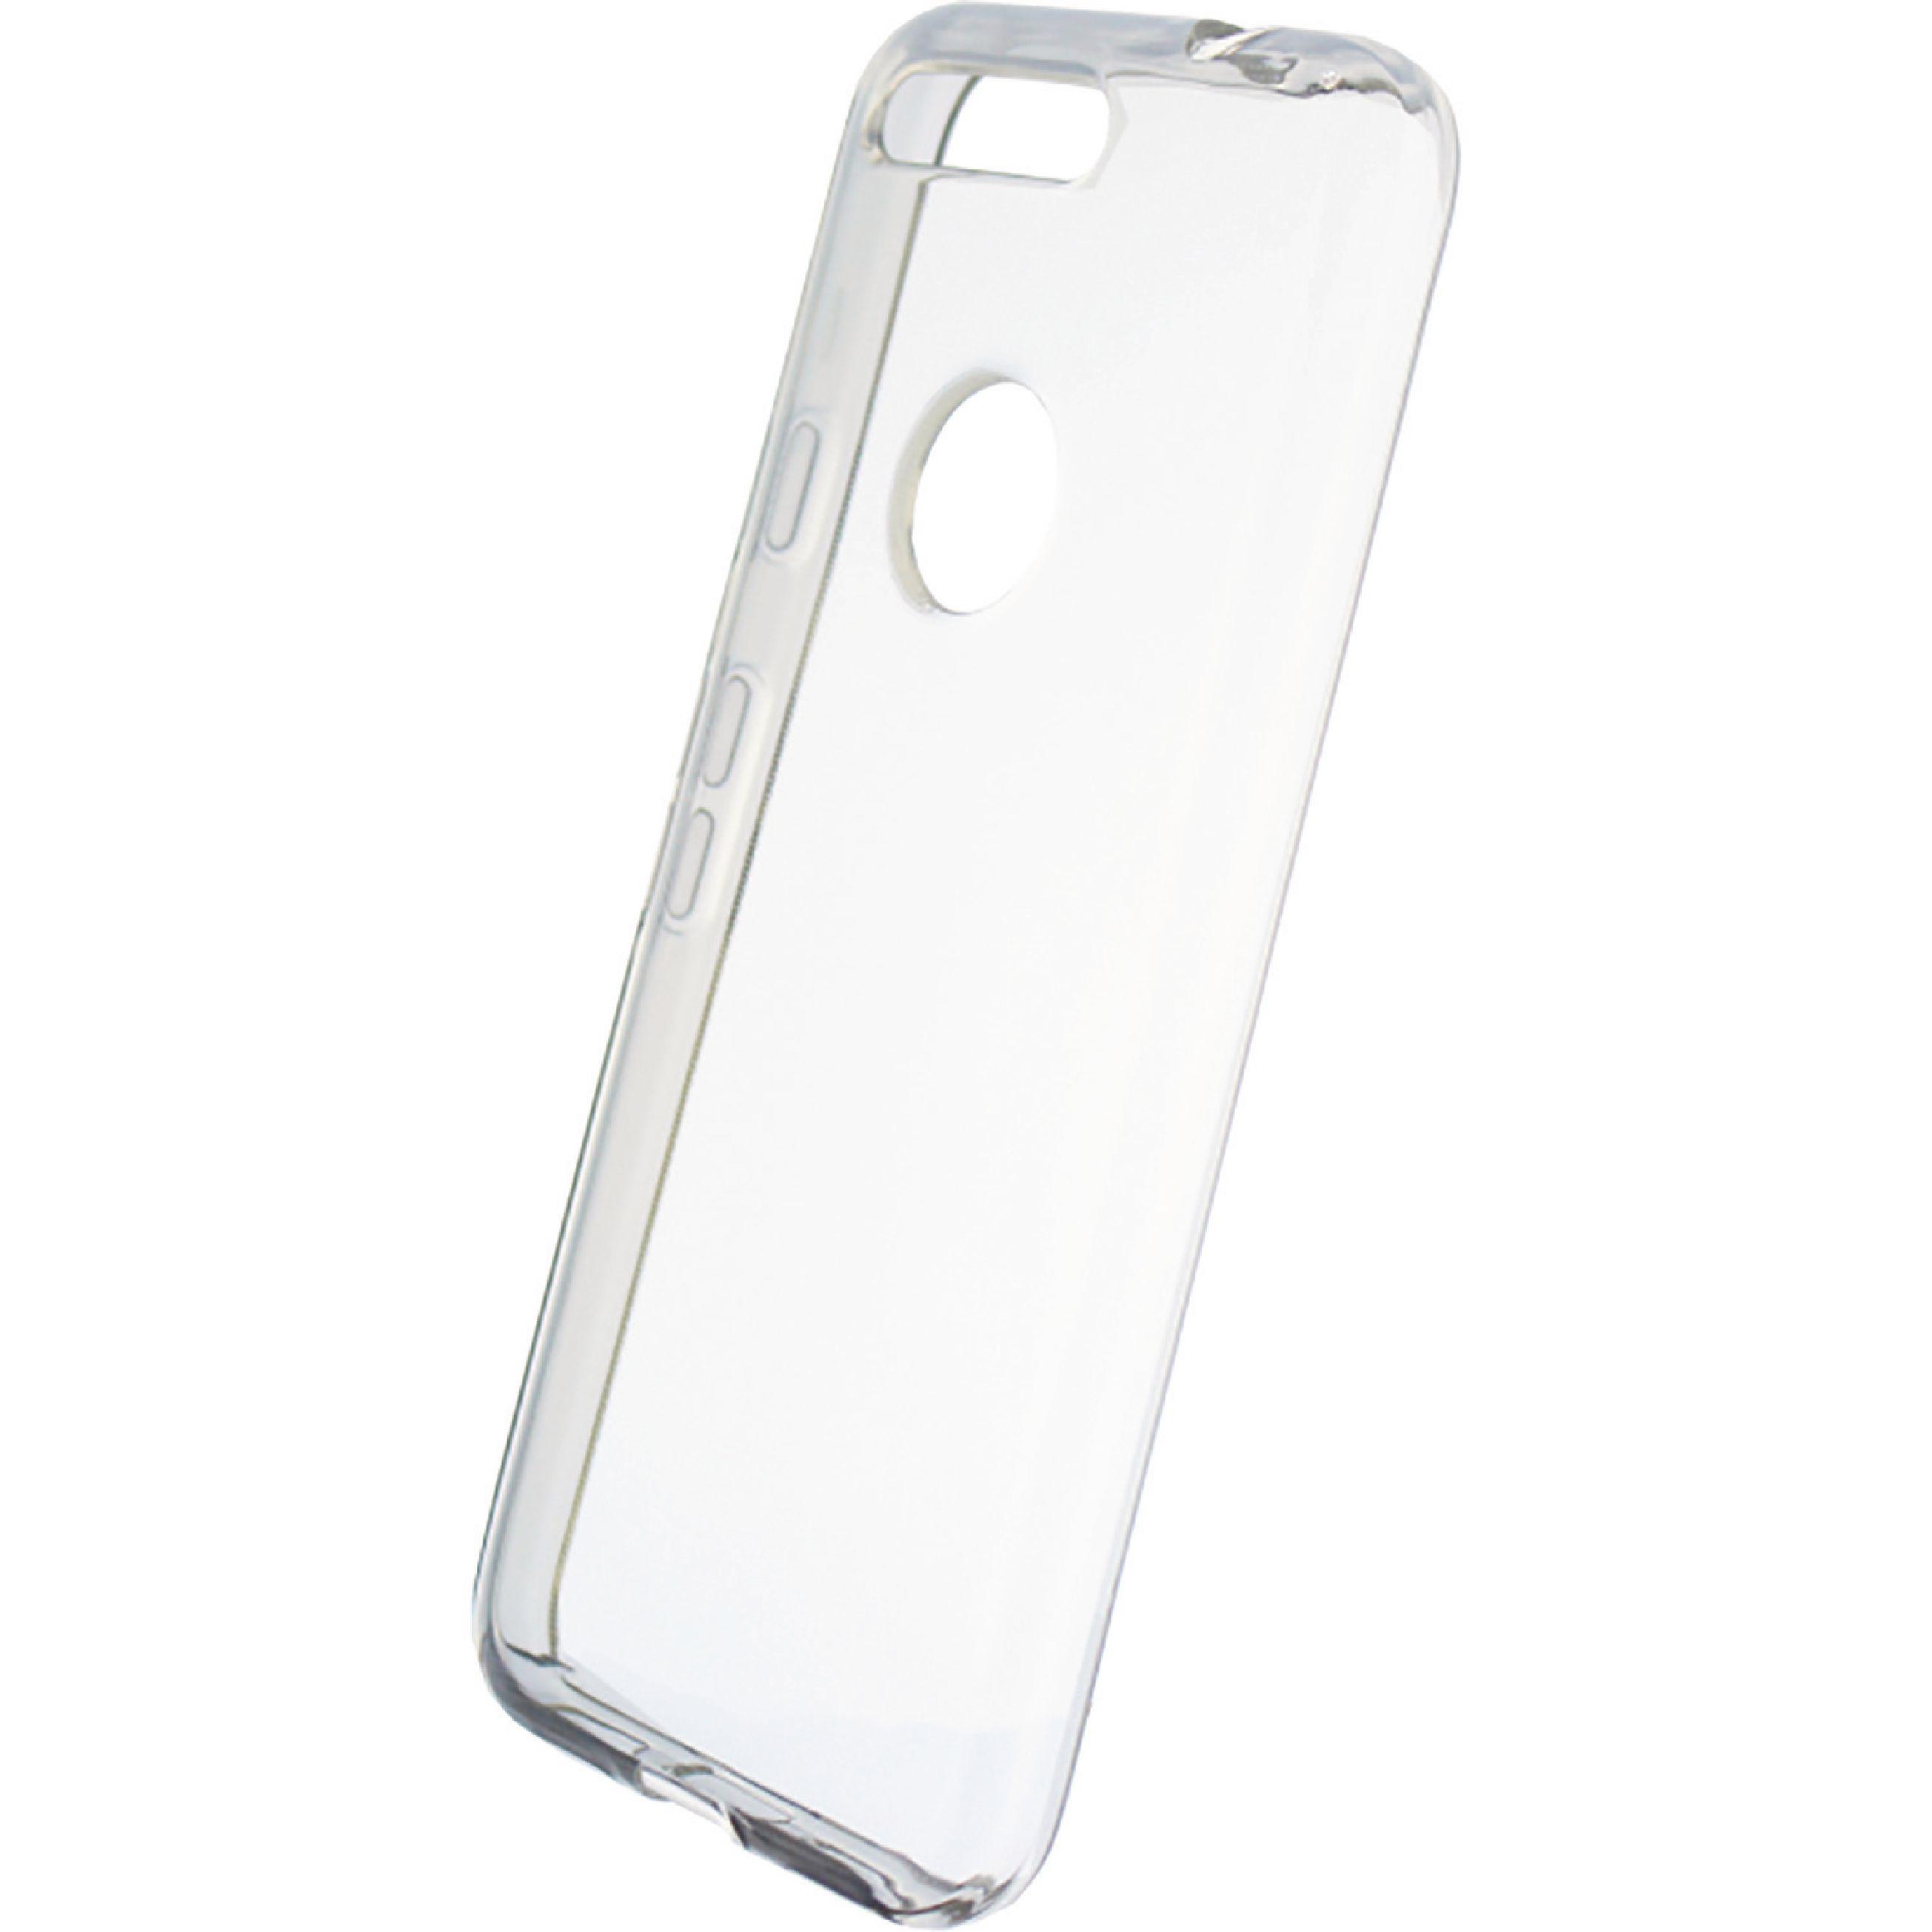 Image of   Telefon Gel-Etui Google Pixel Gennemsigtig